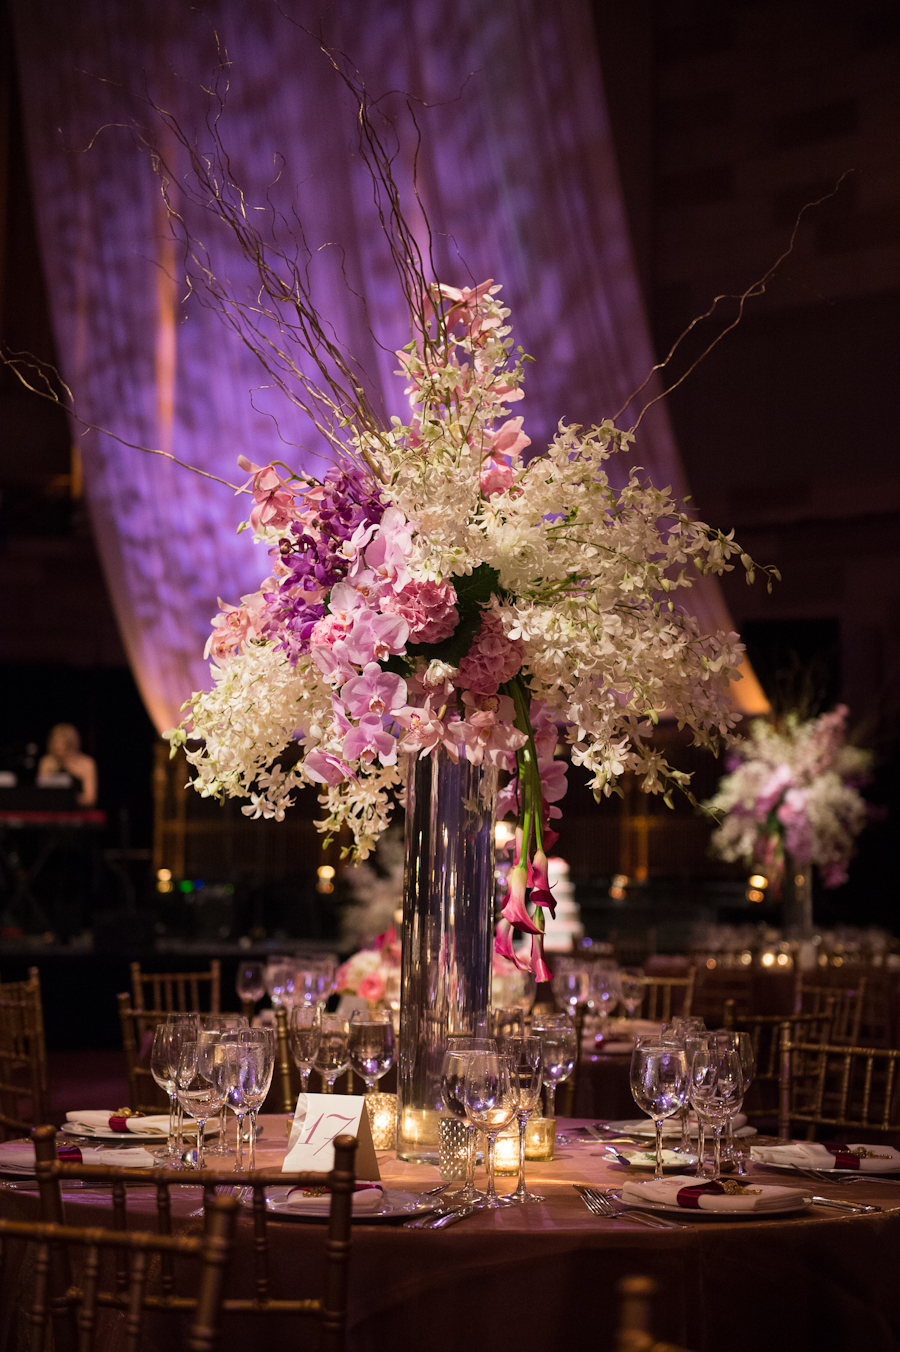 gotham hall brian hatton ang weddings and events-32.jpg